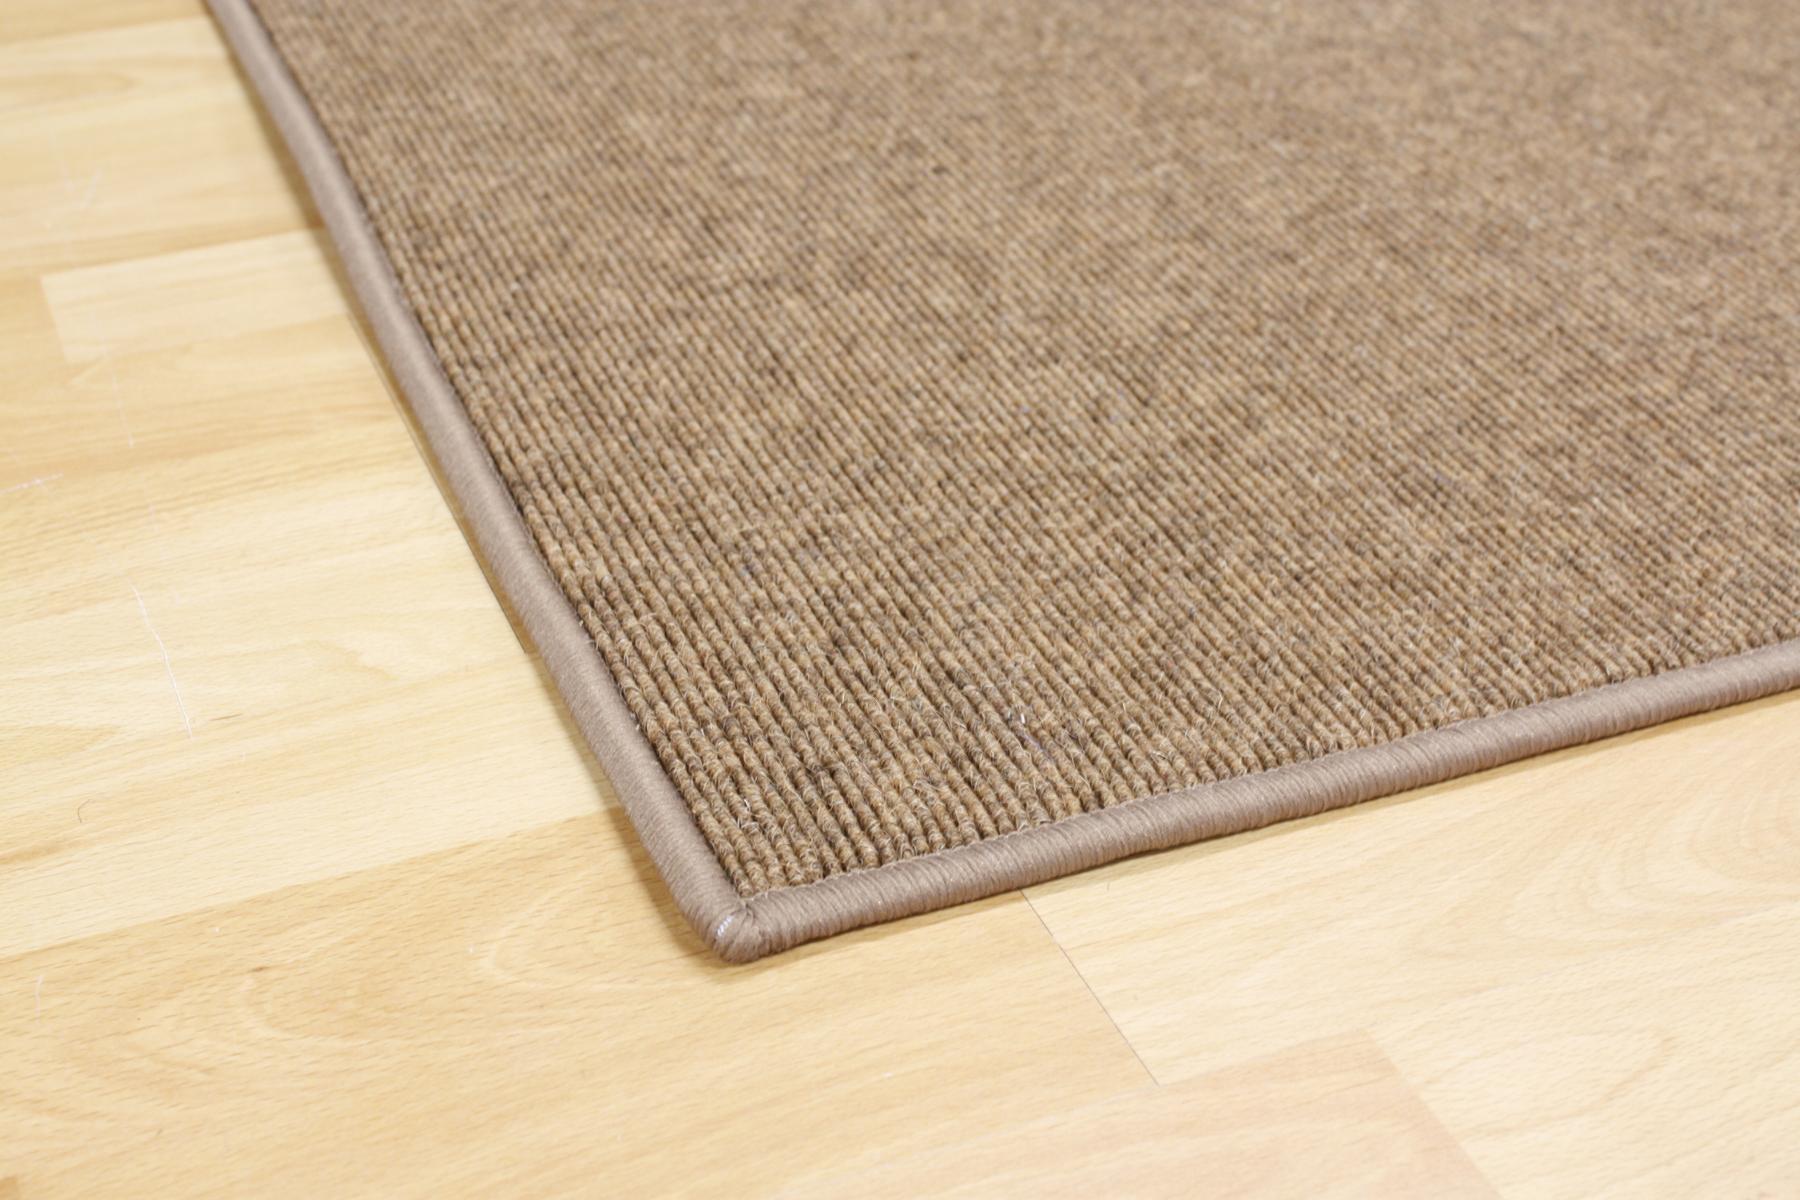 Tappeto tretford 572 overlock 250 x 200 cm peli di capra - Tappeto riscaldamento pavimento ...